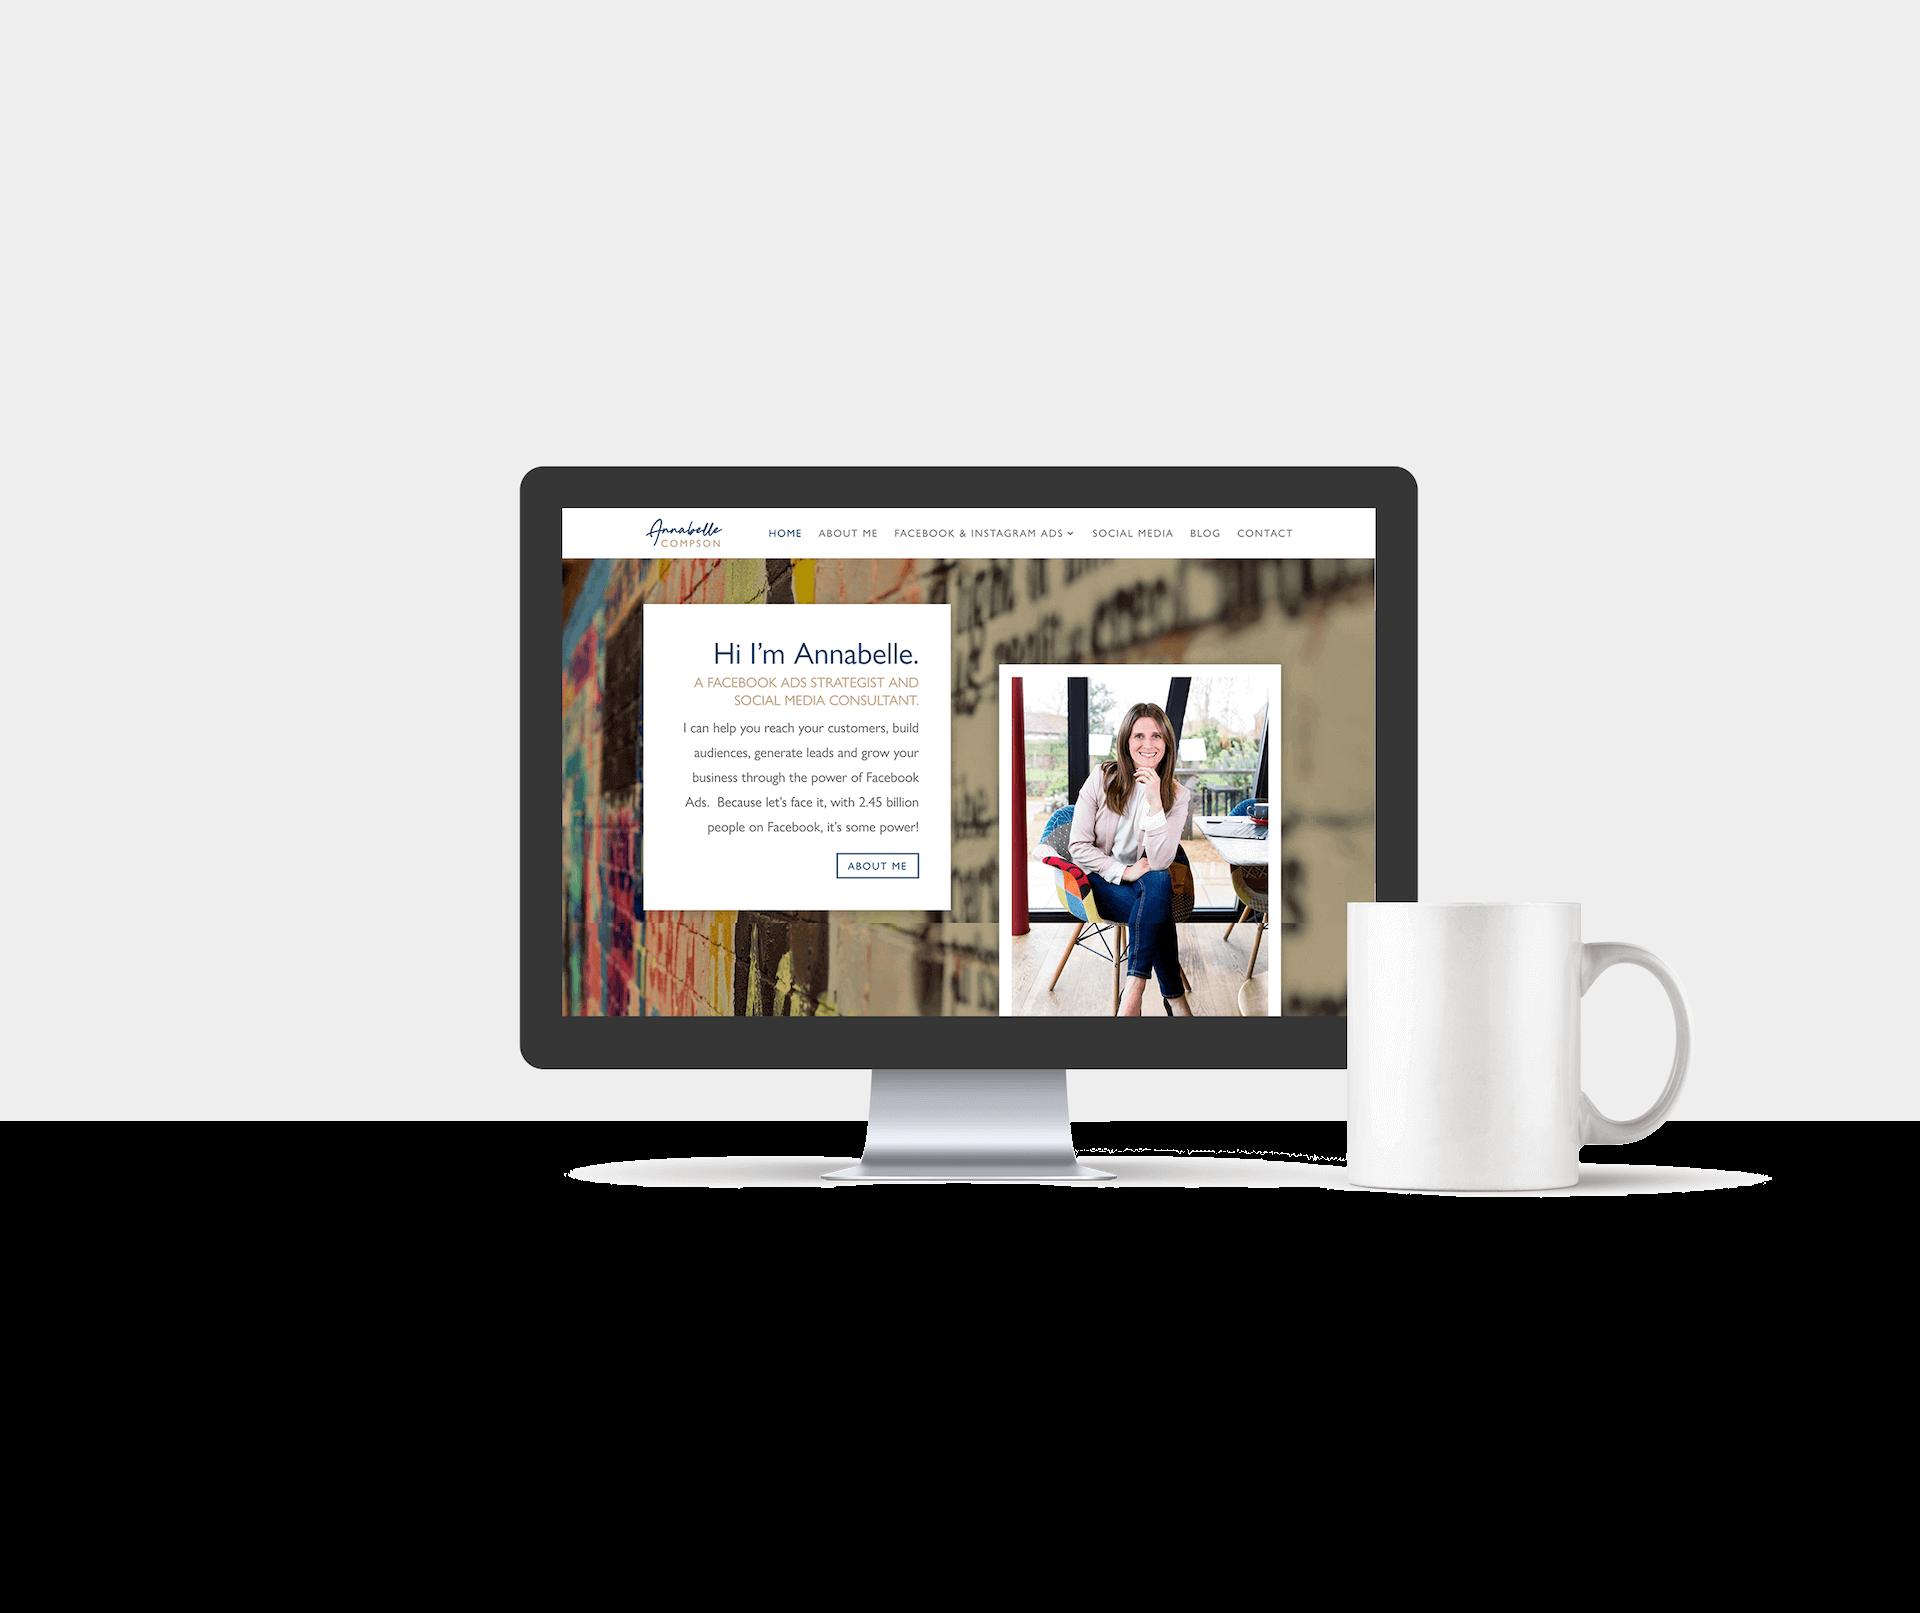 Website design for Annabelle Compson